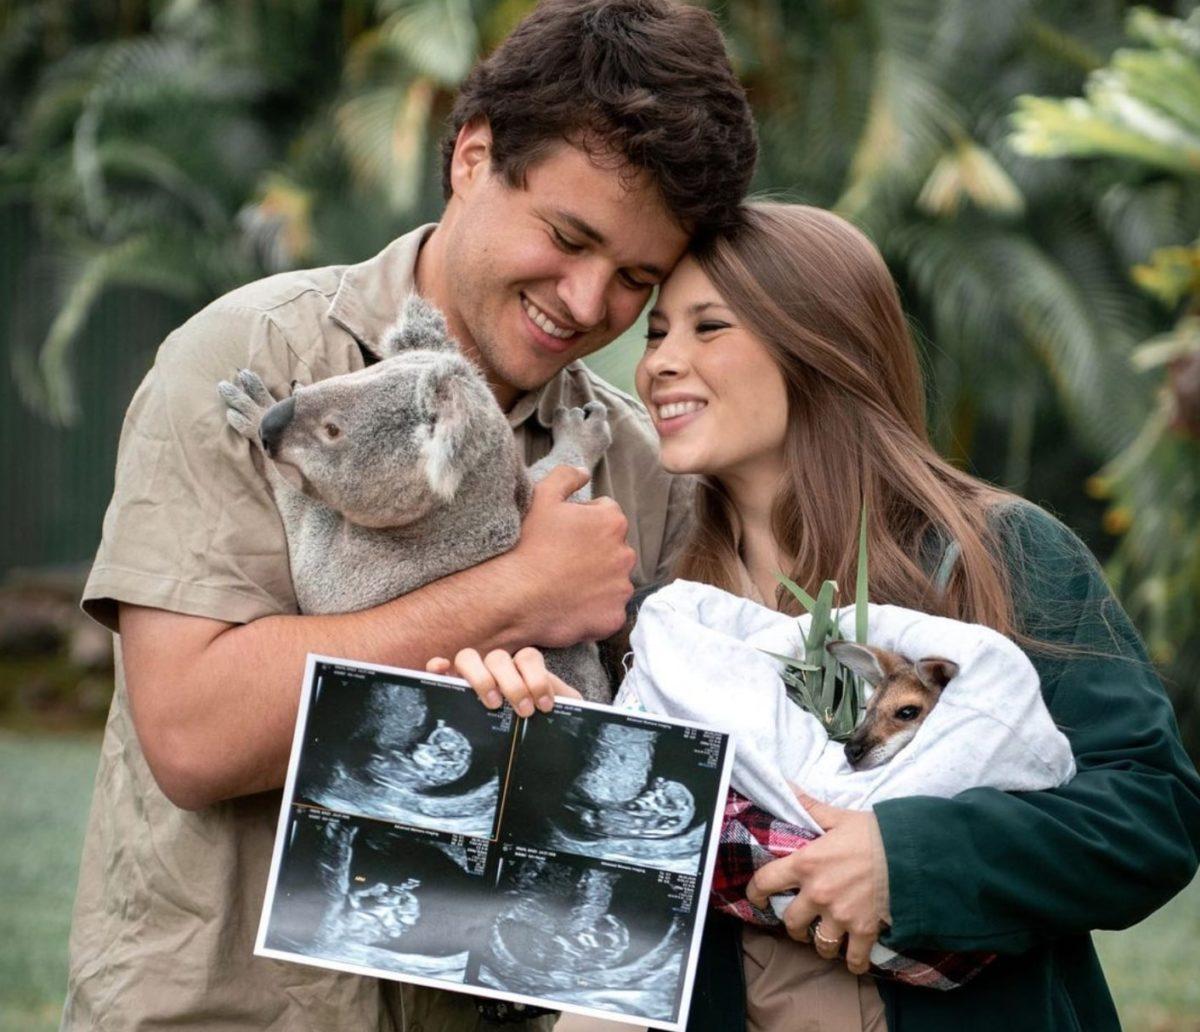 bindi irwin reveals very first baby bump picture!